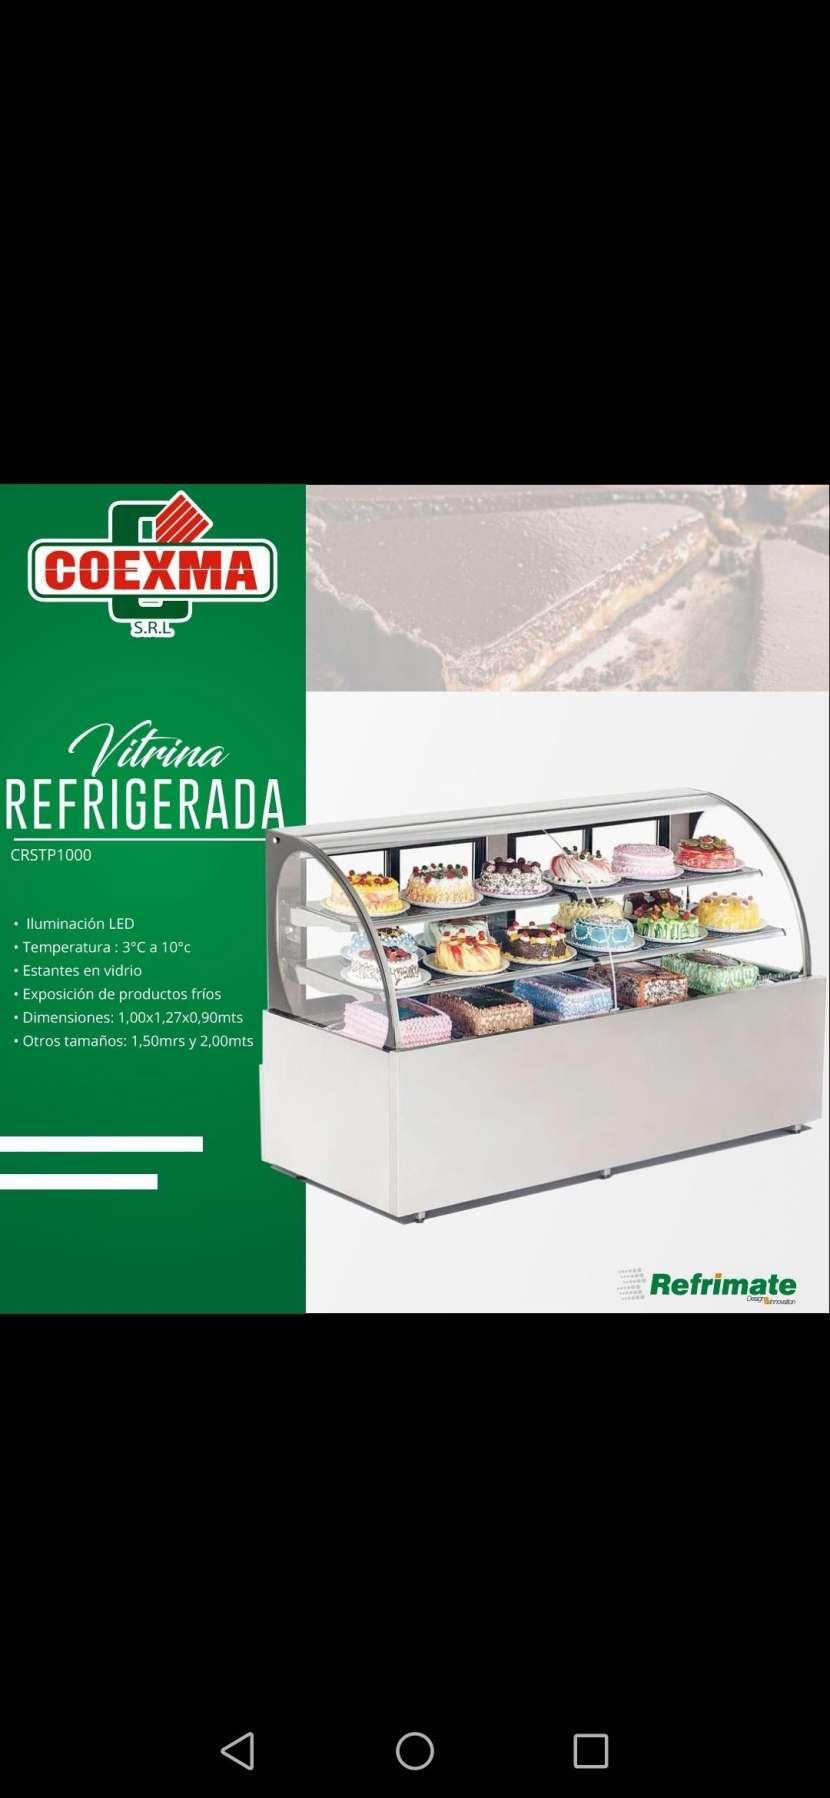 Vitrina refrigerada Refrimate - 1